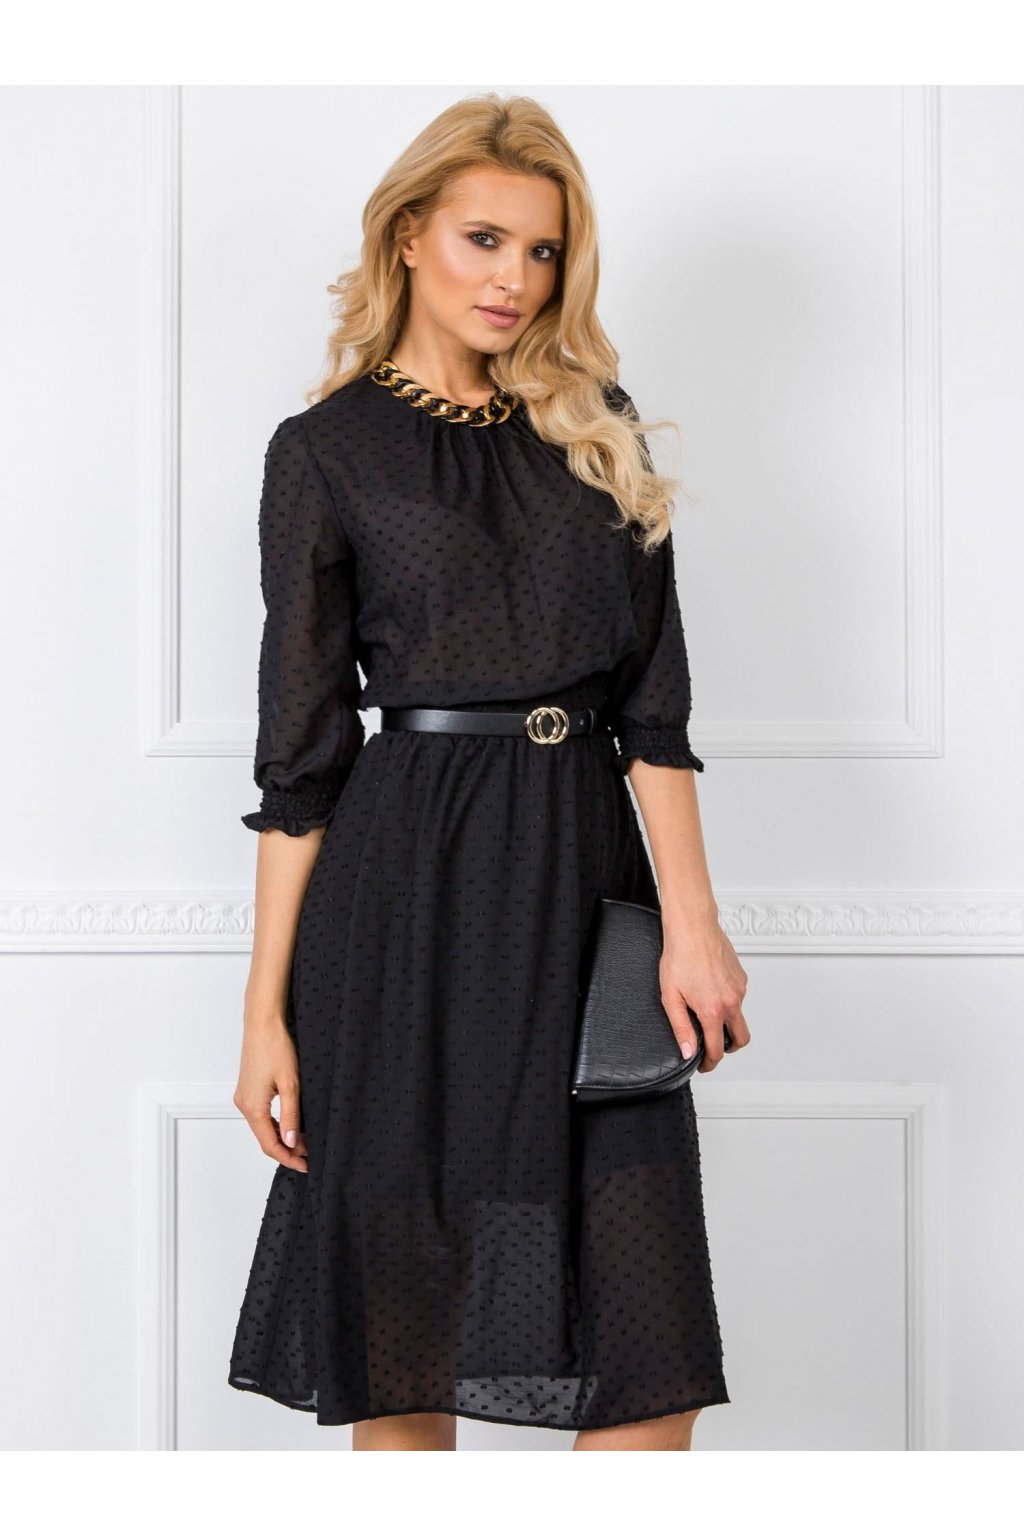 213442cc874b Elegantné šaty s čipkou 7090 biele - Tentation.sk